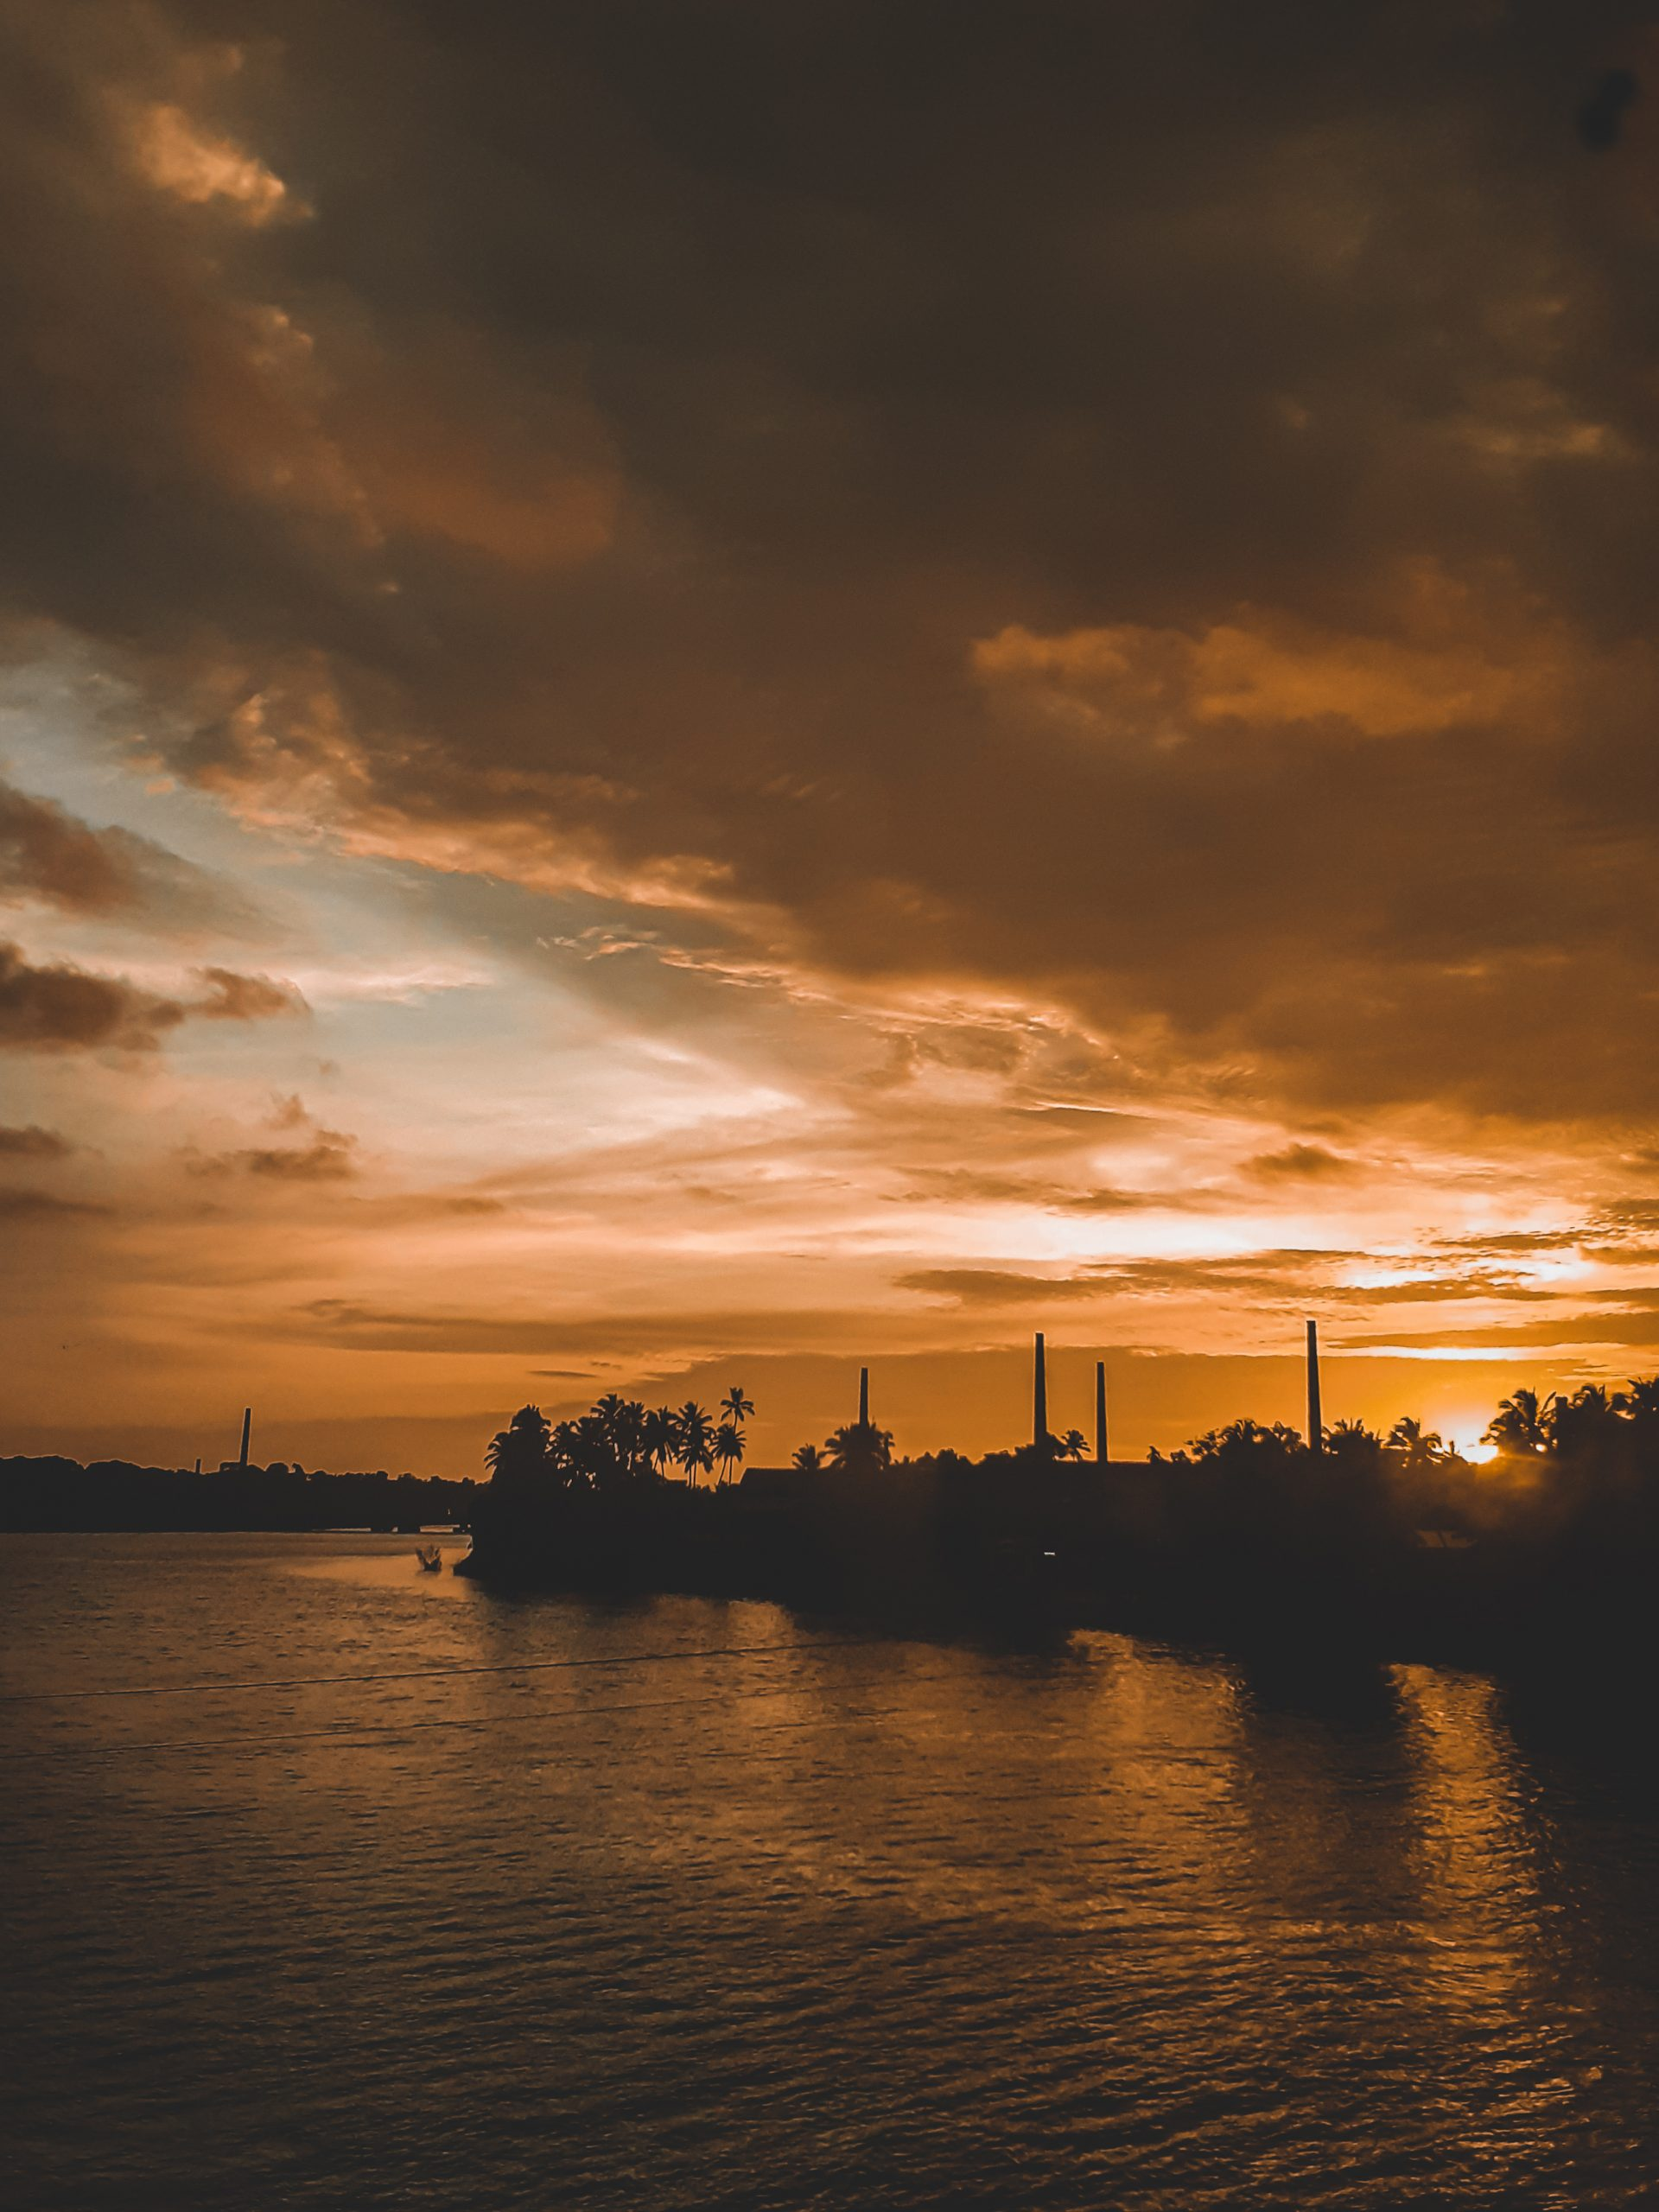 Sunset hour in Calicut, Kerala.